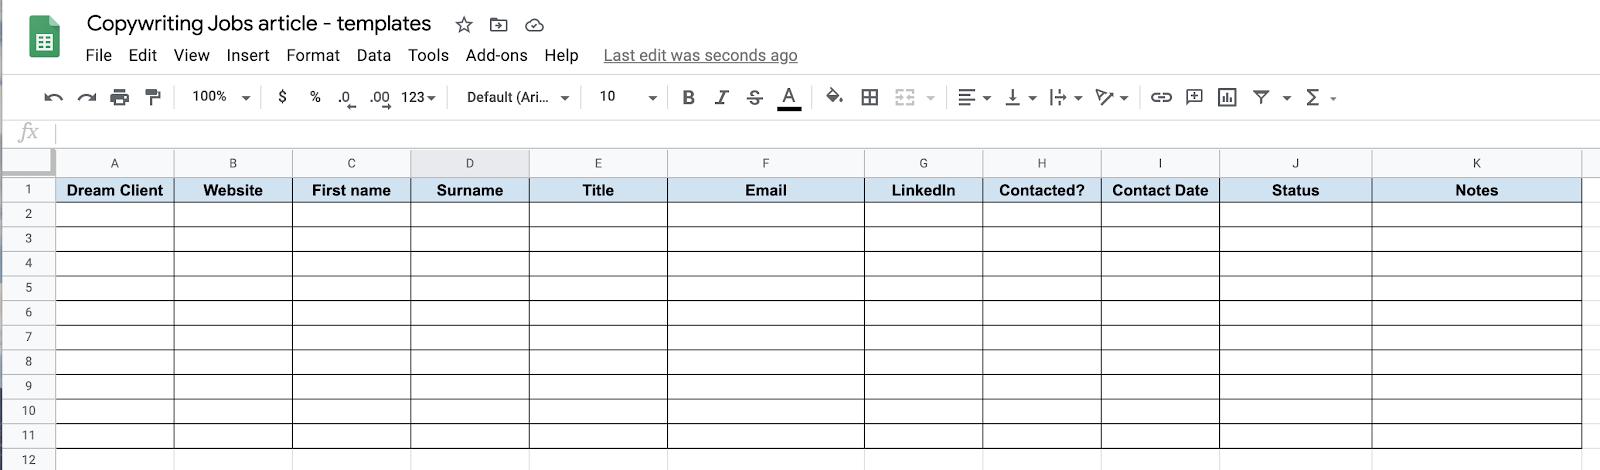 Copywriting job application tracking spreadsheet